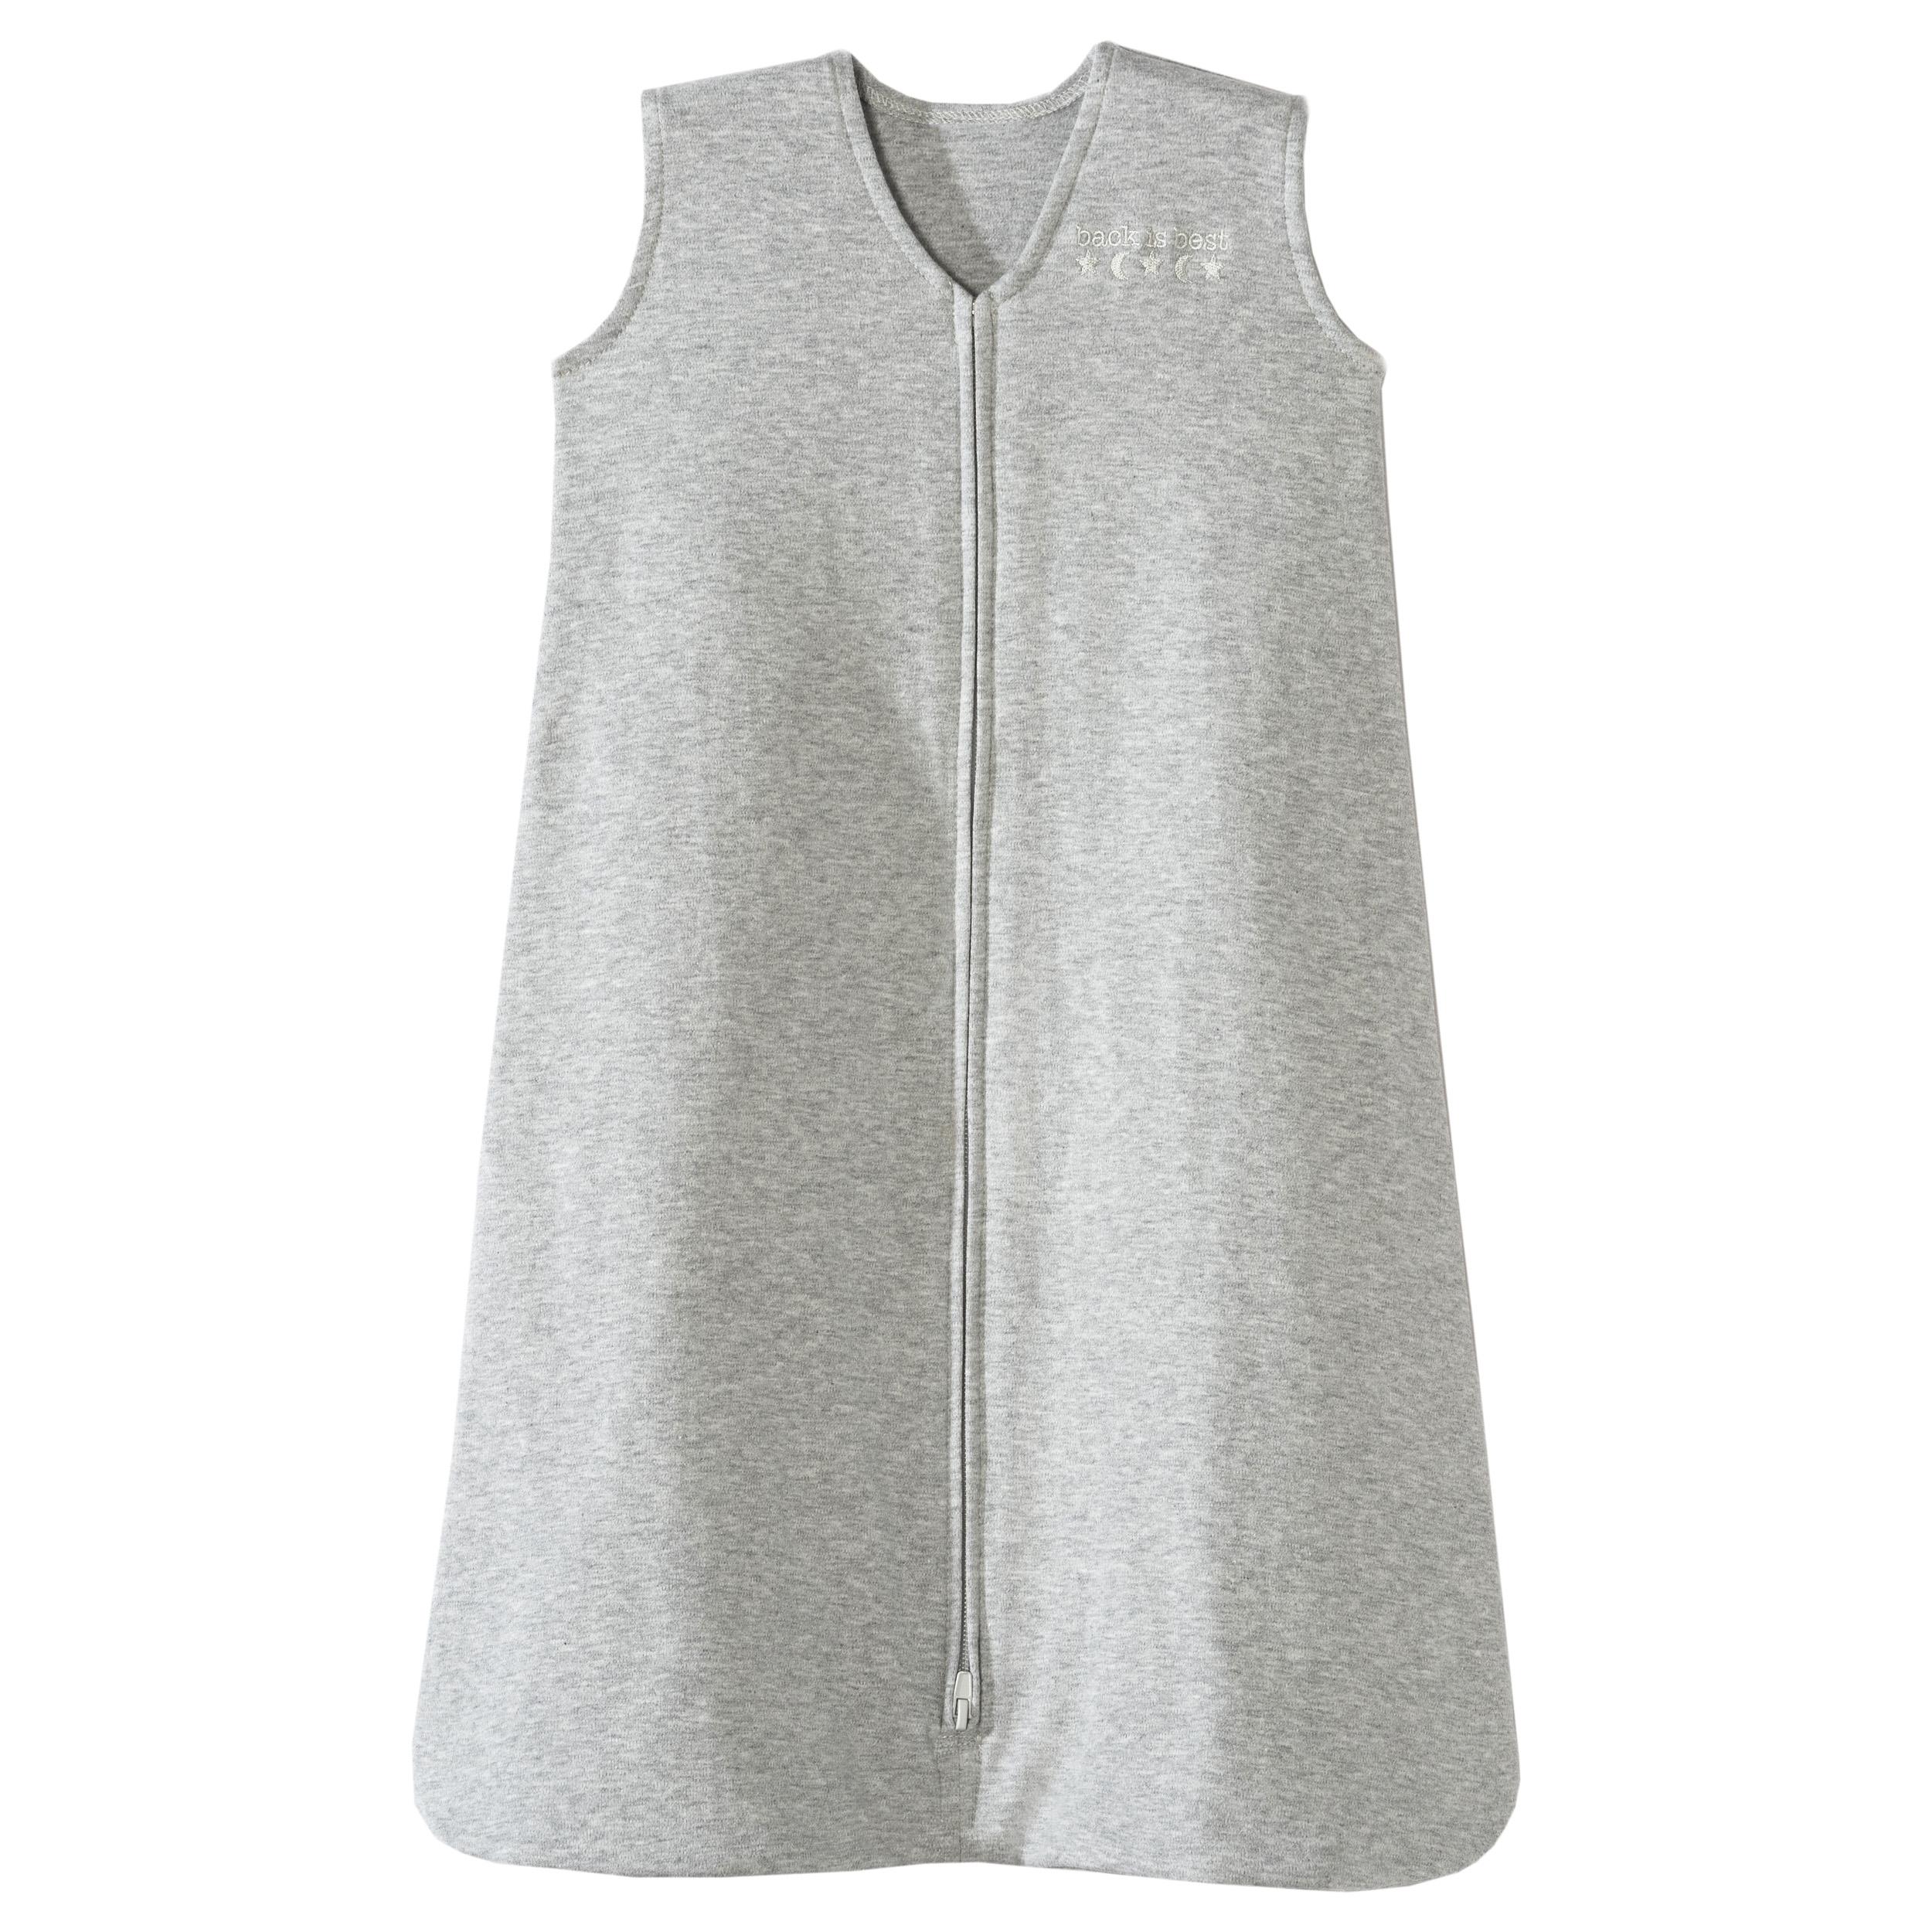 HALO SleepSack Wearable Blanket Cotton Solid Gray - SM